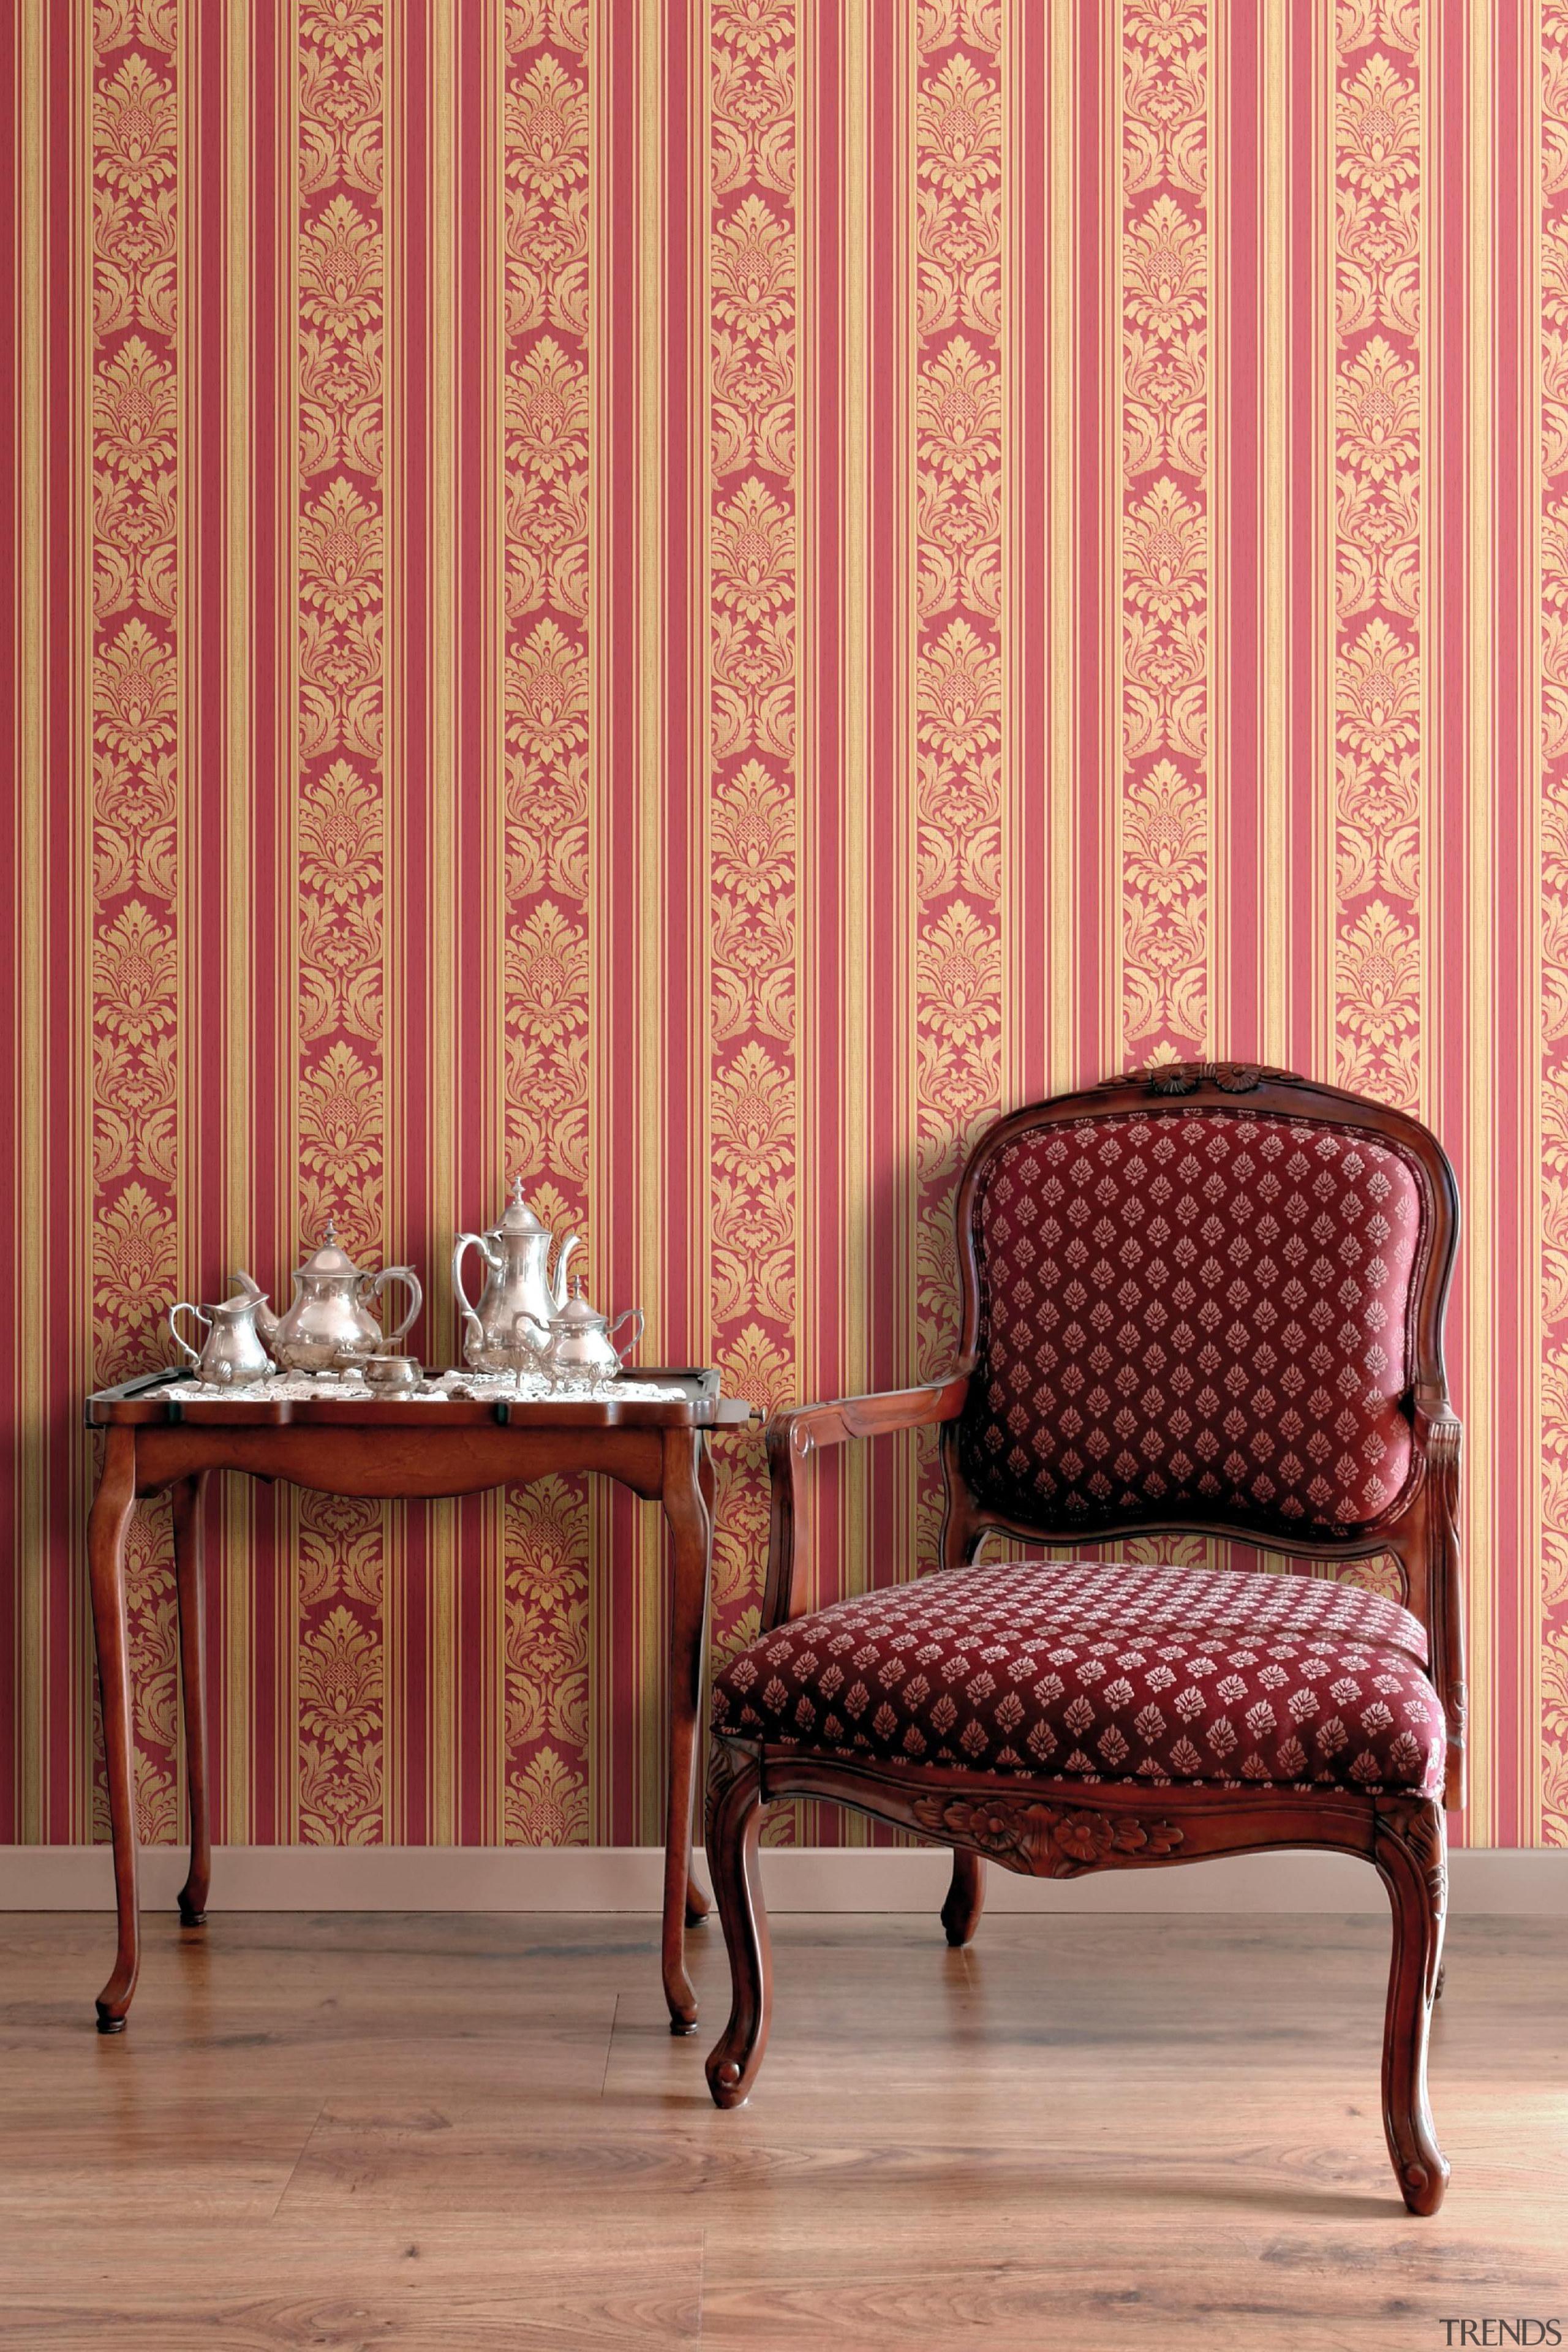 New Belaggio Range - New Belaggio Range - chair, couch, curtain, decor, floor, flooring, furniture, interior design, living room, pattern, table, wall, wallpaper, window, window covering, window treatment, wood, orange, red